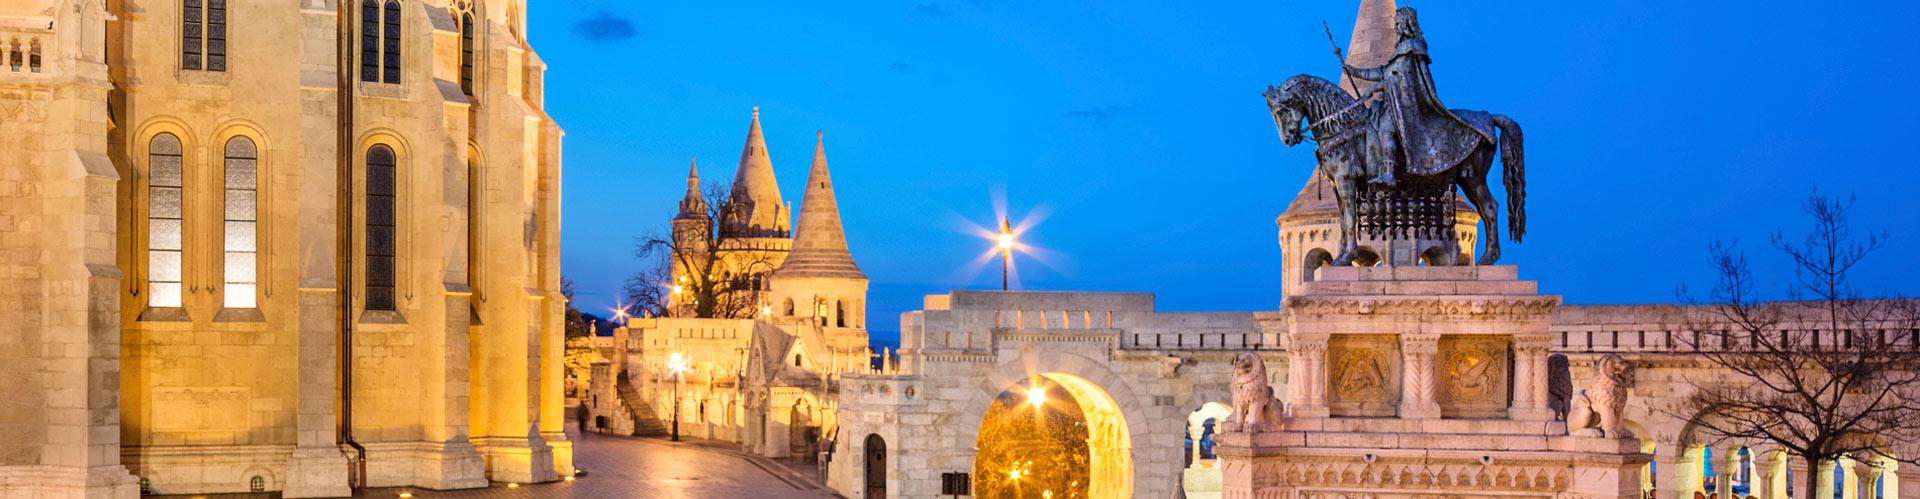 monumento-Bastion-Pescatori-Budapest-iStock_000069771023_Medium